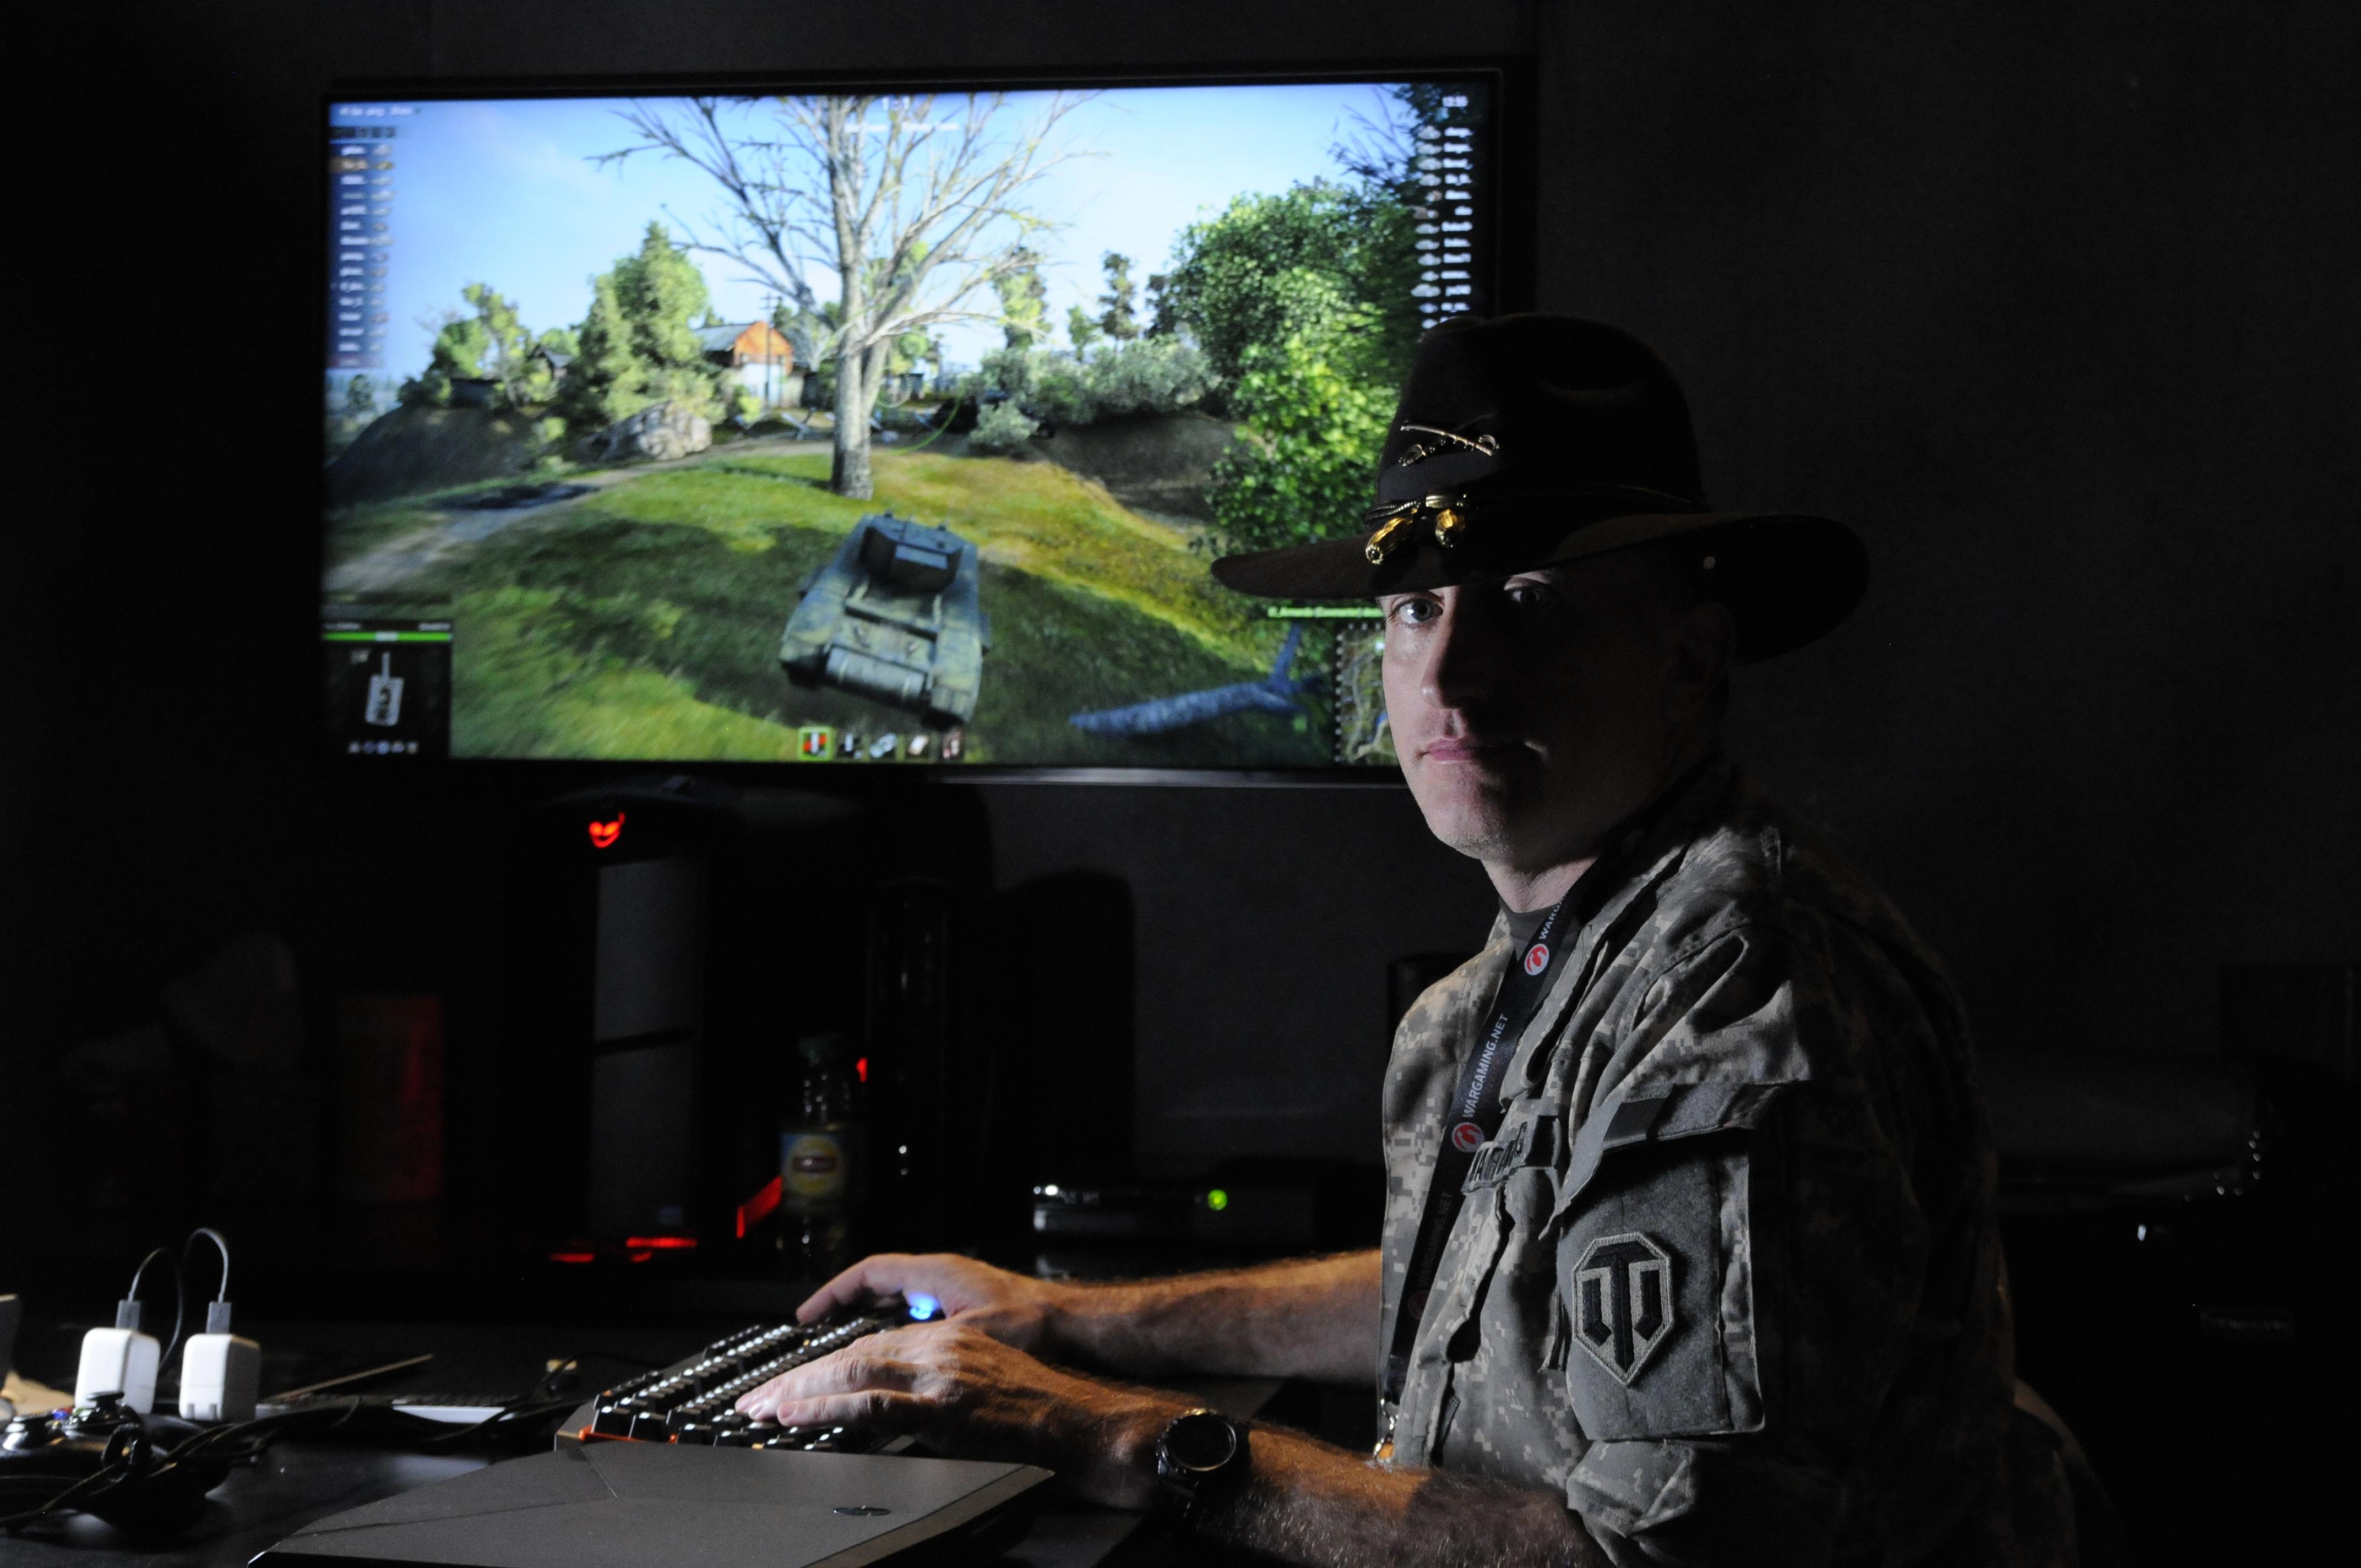 Tanker-historian-gamer has the perfect civilian job